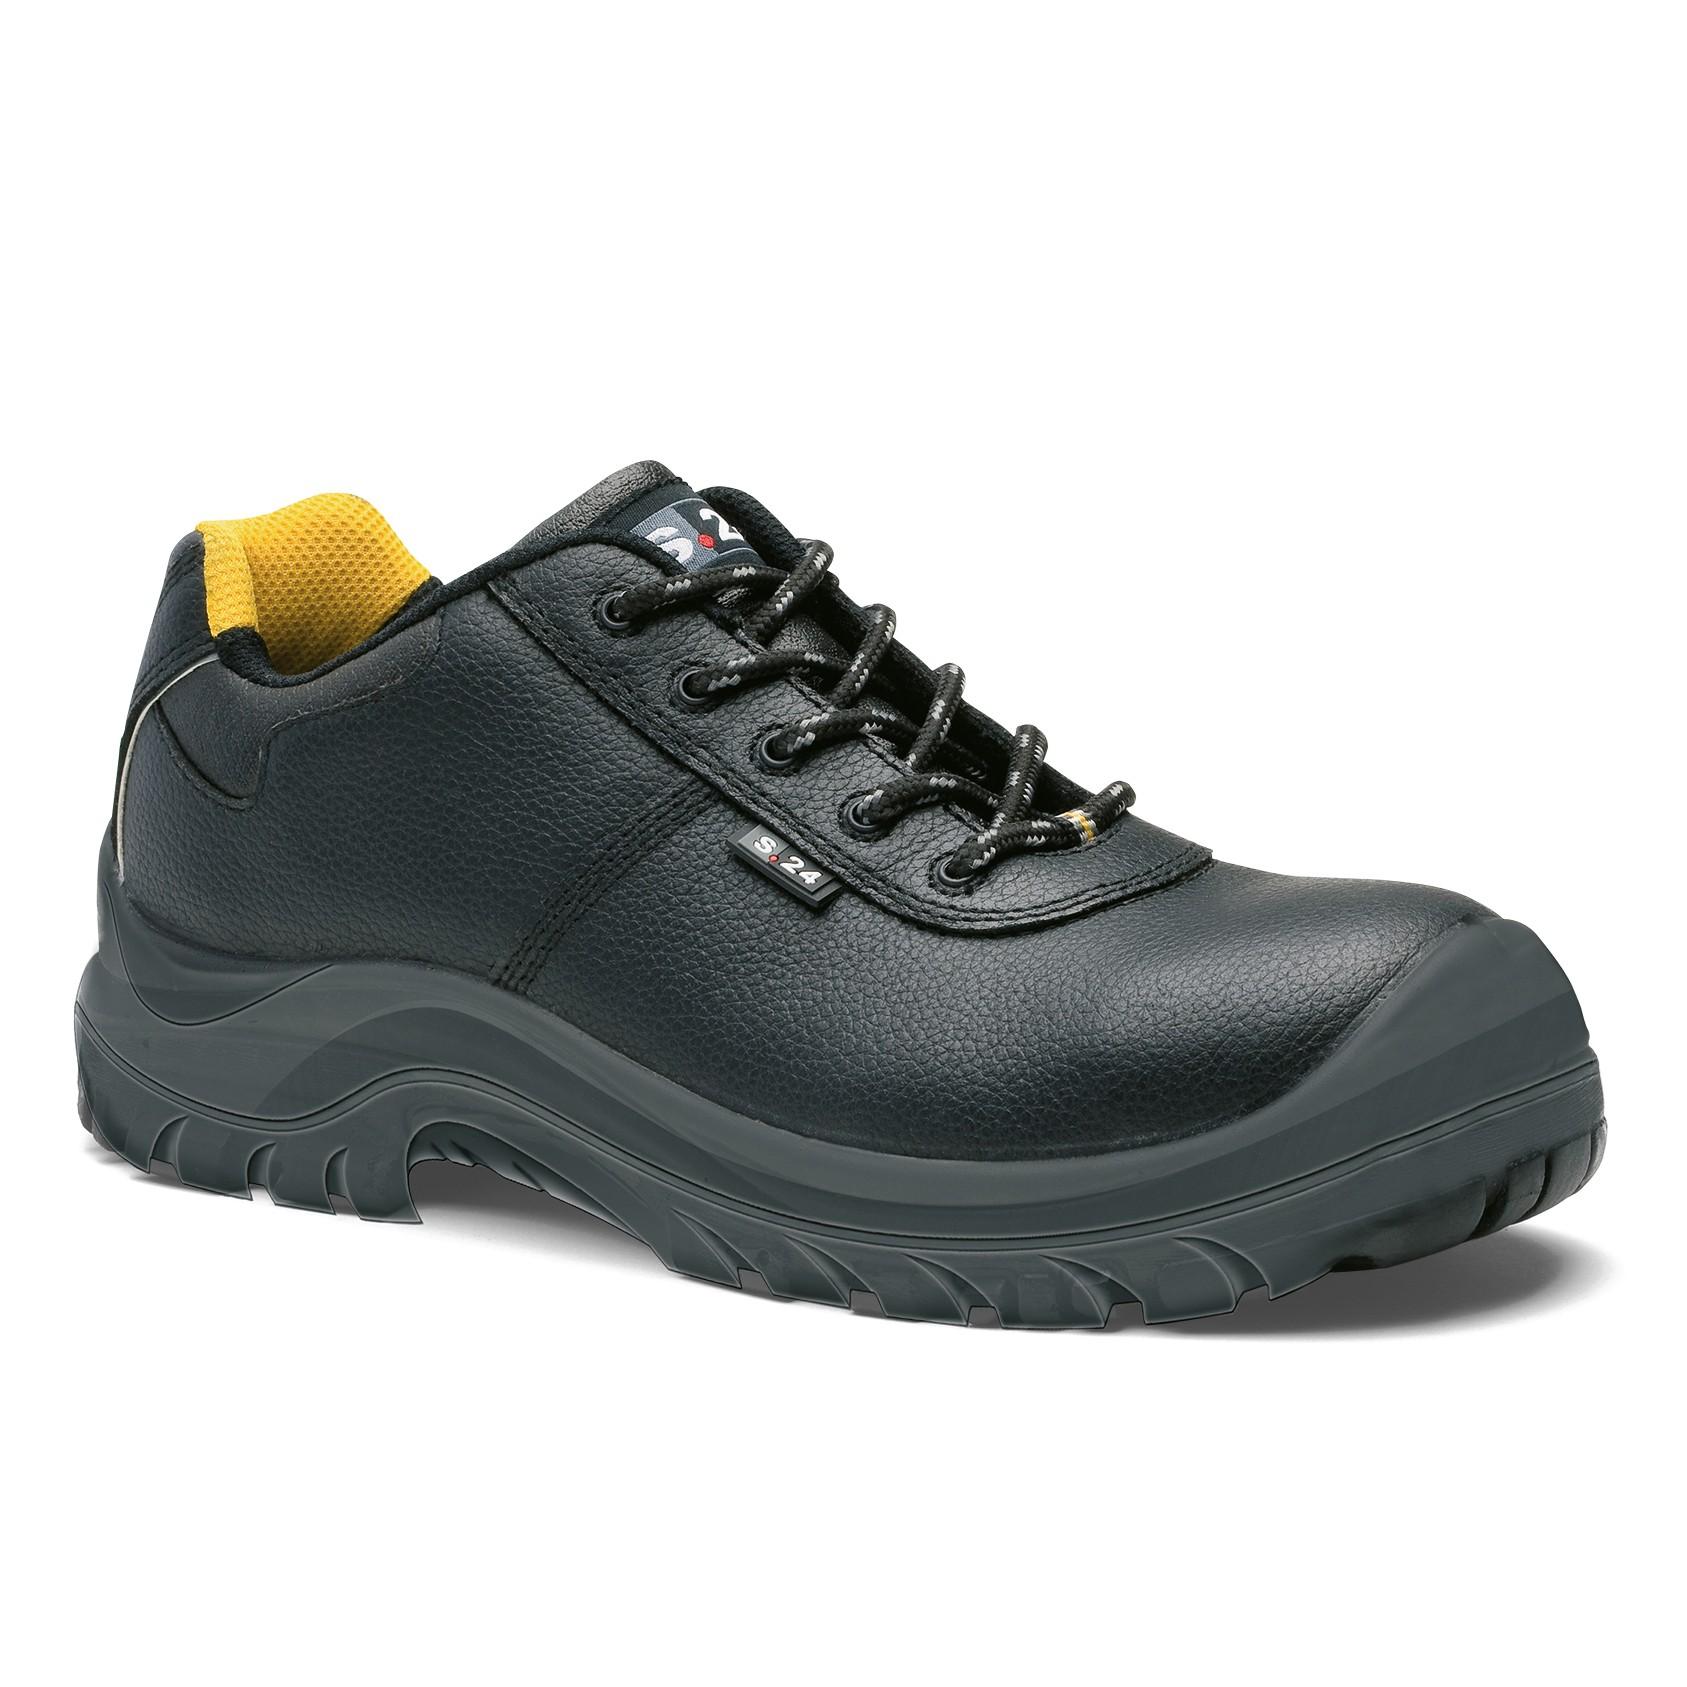 Chaussure de securite basse...